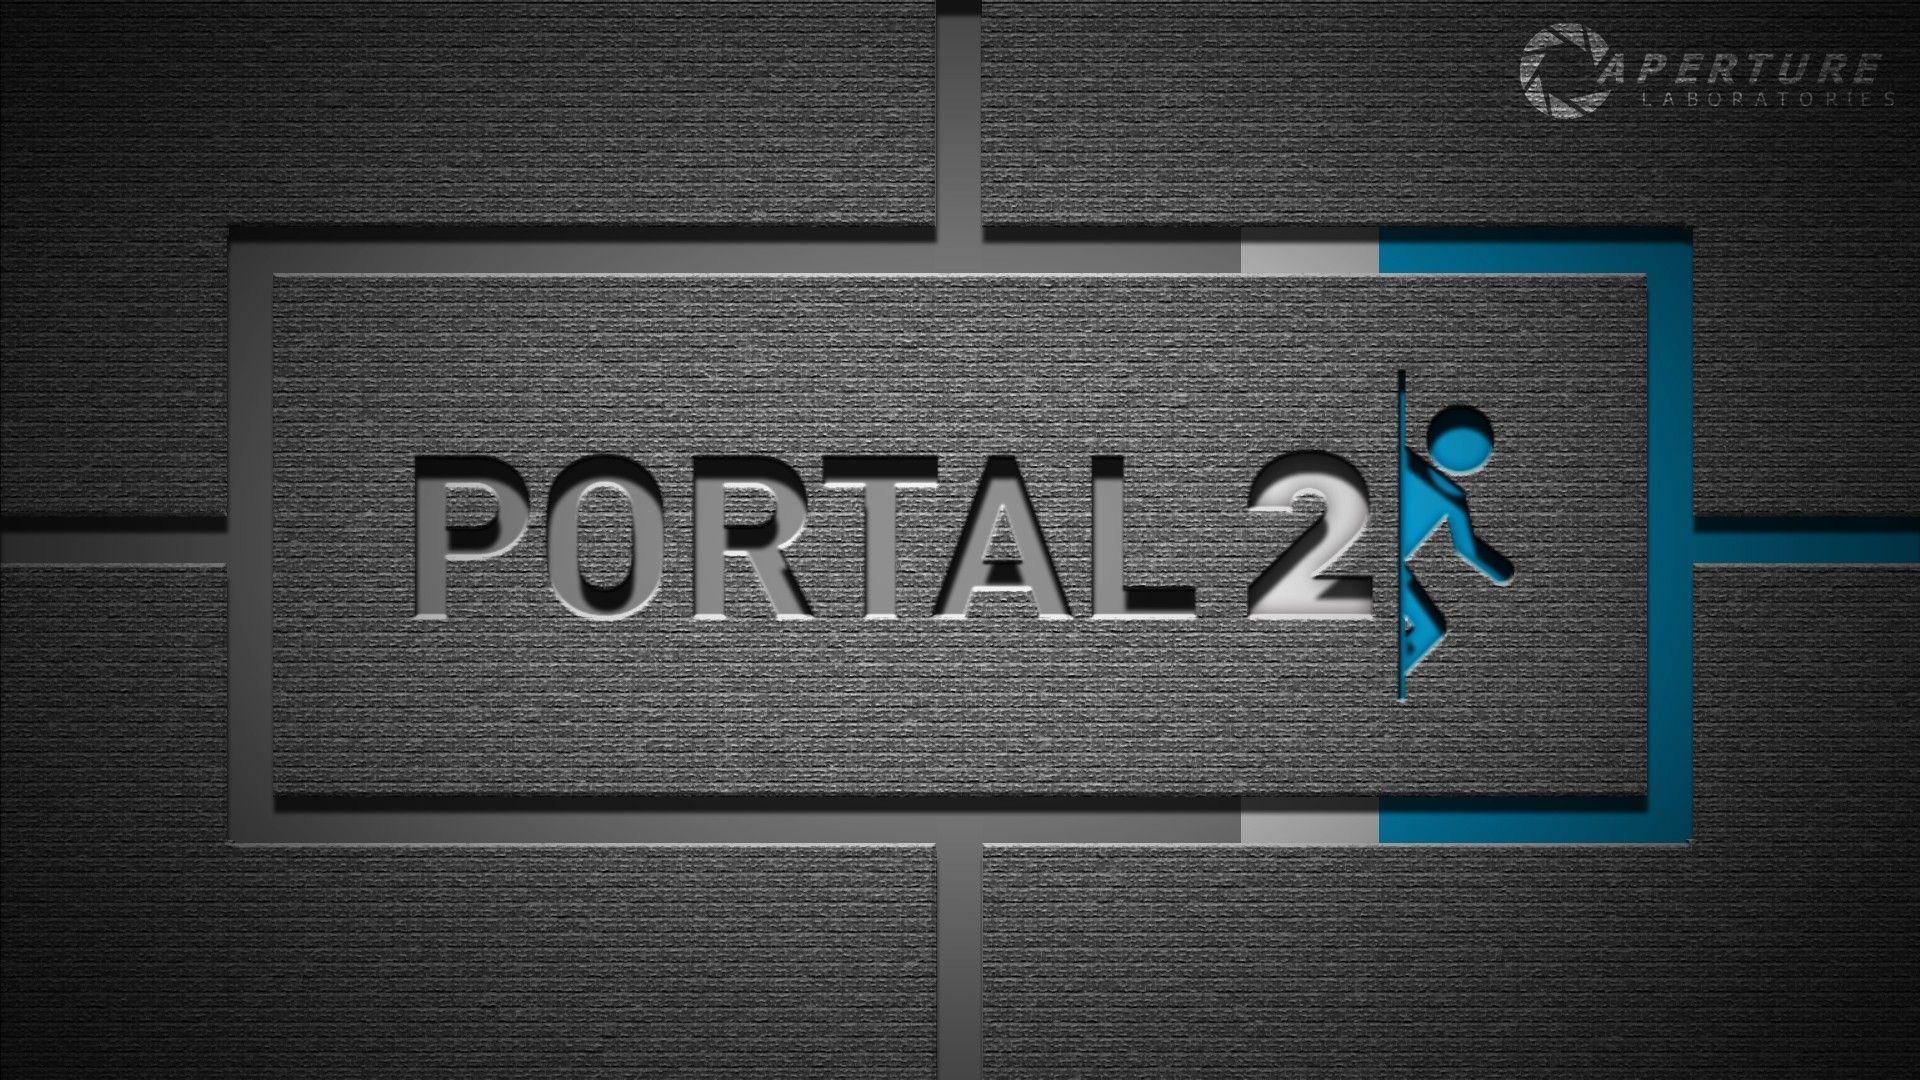 19+ Portal screensaver ideas